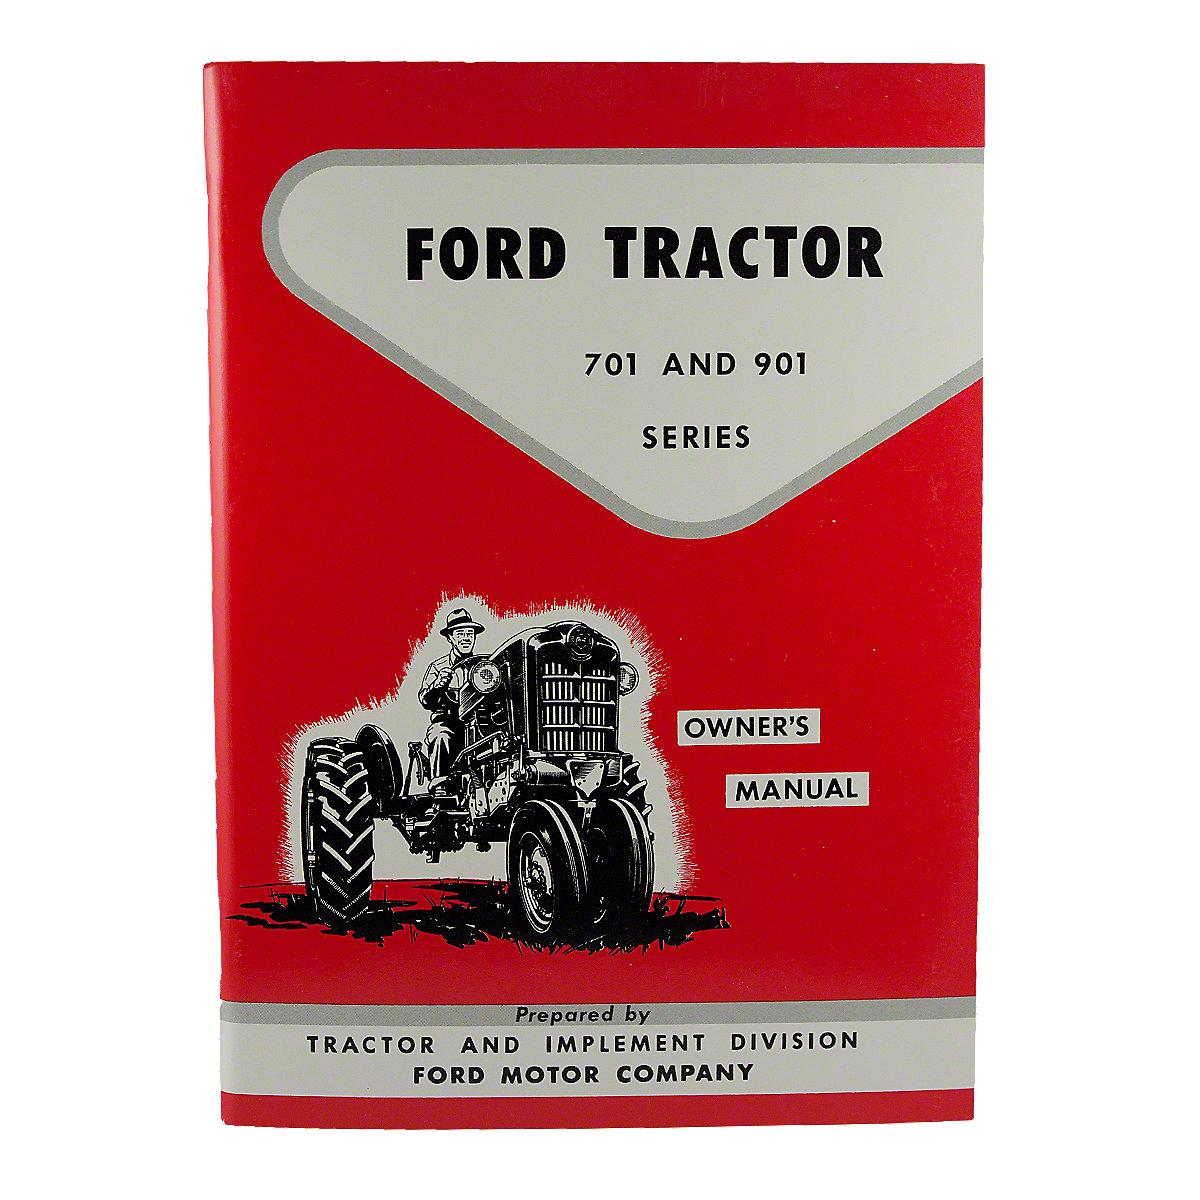 Distributor Bushing And Shim Kit Ford Repair Fds3253 601 Workmaster 12 Volt Wiring Diagrams Operator Manual Reprint 701 901 Series